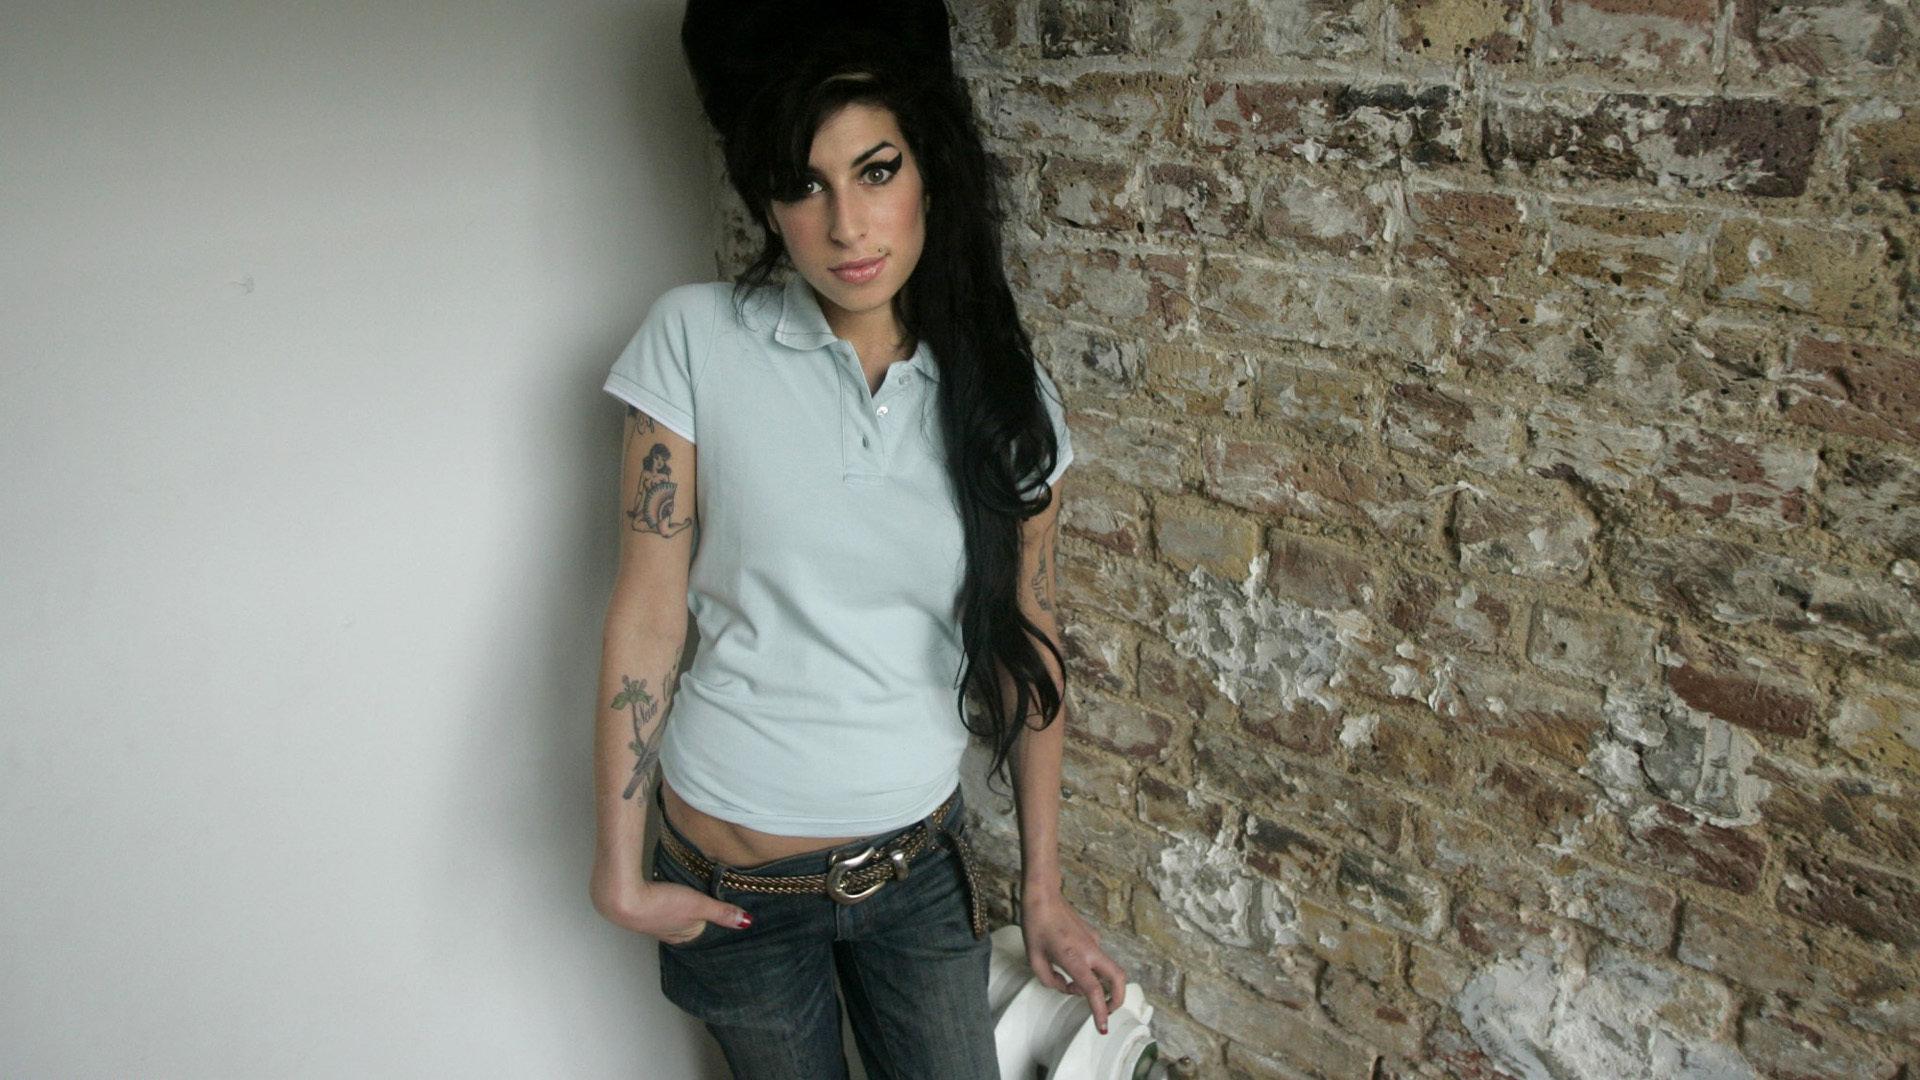 Amy Winehouse Wallpapers 1920x1080 Full Hd 1080p Desktop Backgrounds